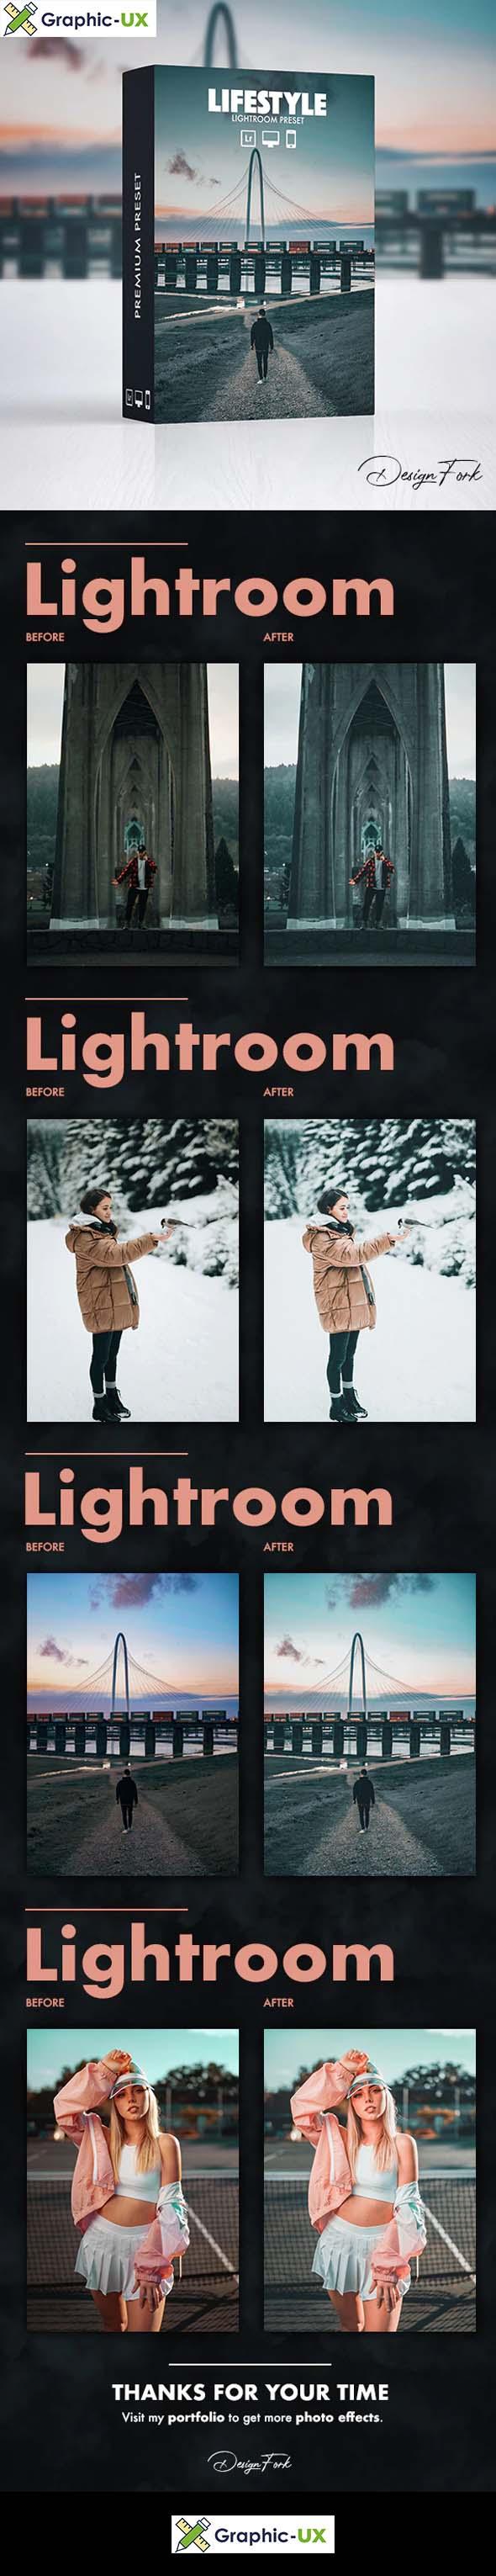 Lifestyle FX Lightroom Preset